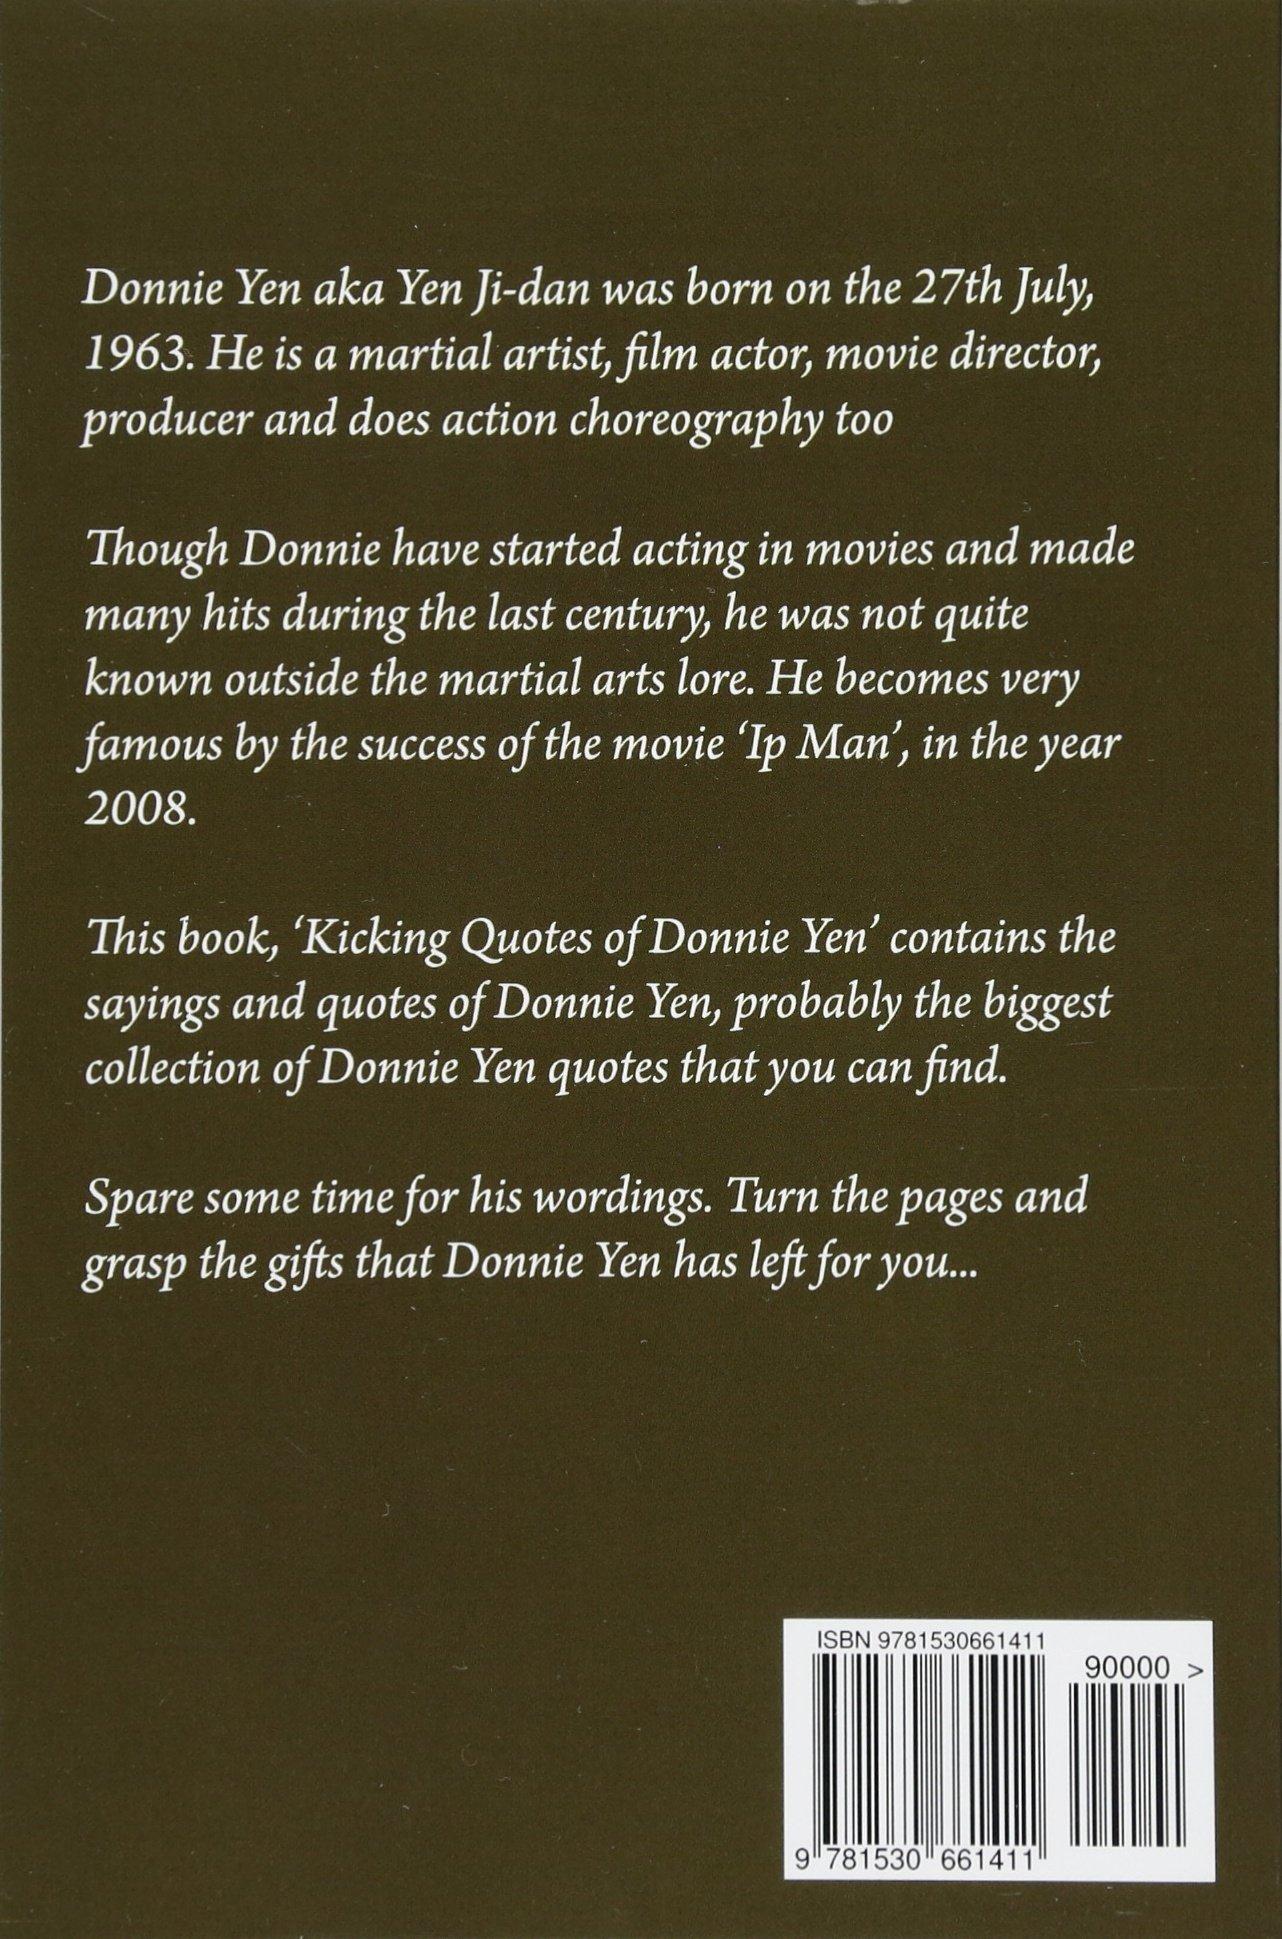 Kicking Quotes Of Donnie Yen Sreechinth C 9781530661411 Amazon